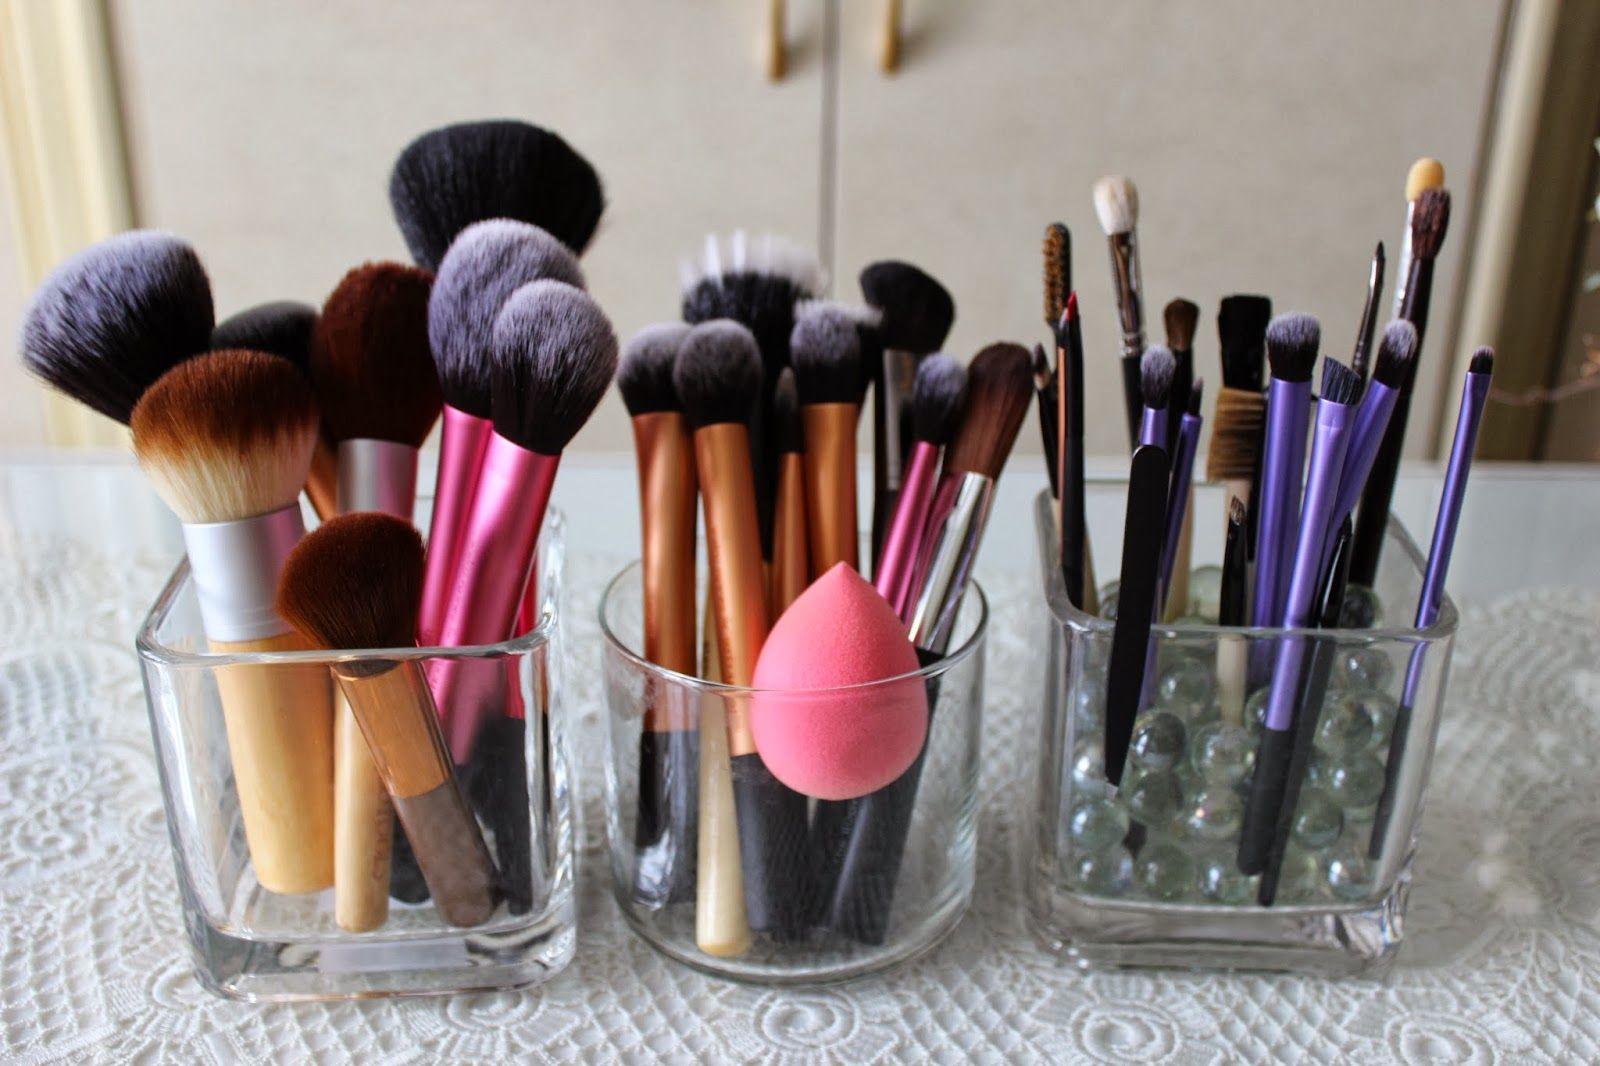 My Makeup Brush Storage and Organization Makeup brush